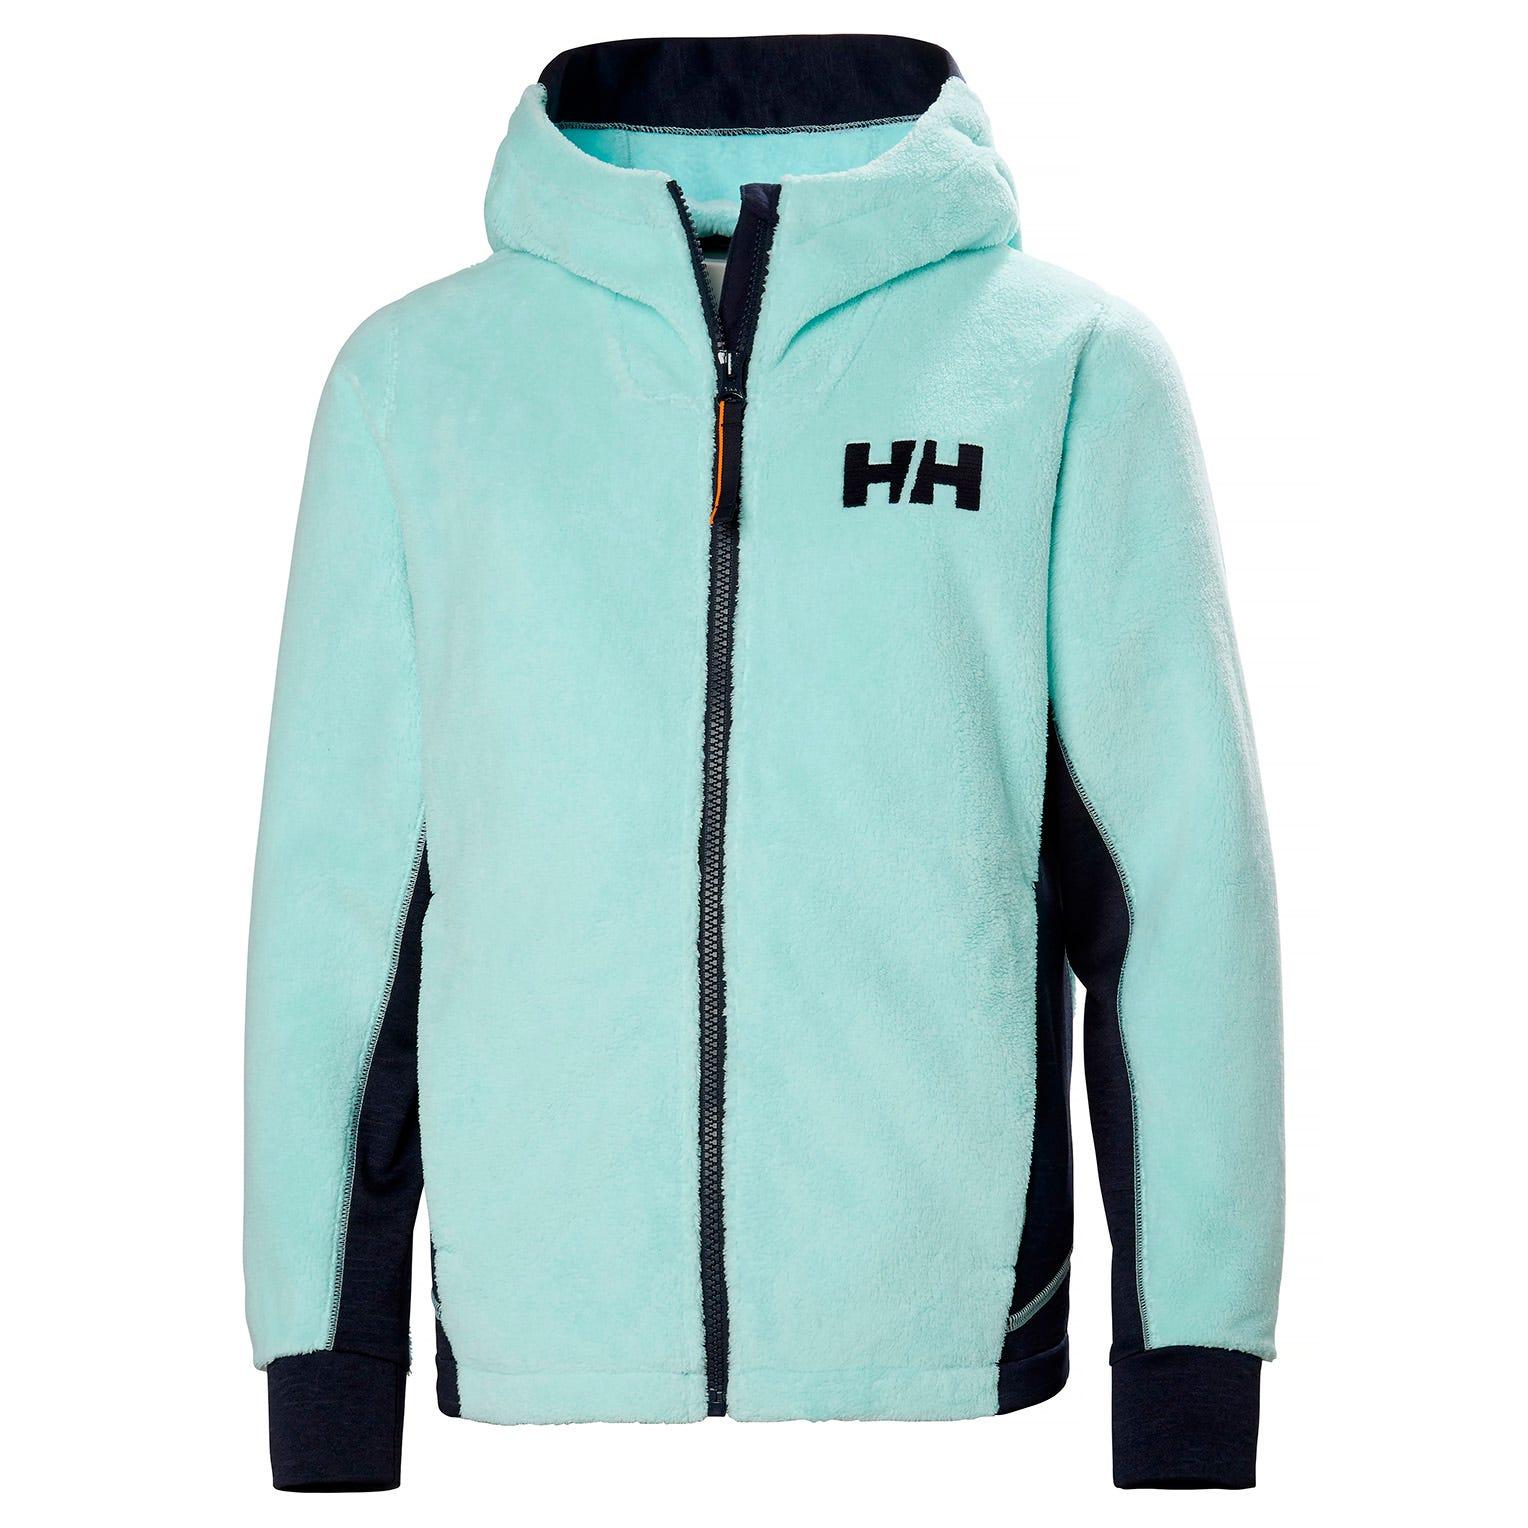 Helly Hansen Junior Chill Fz Hoodie Kids Fleece Blue 140/10